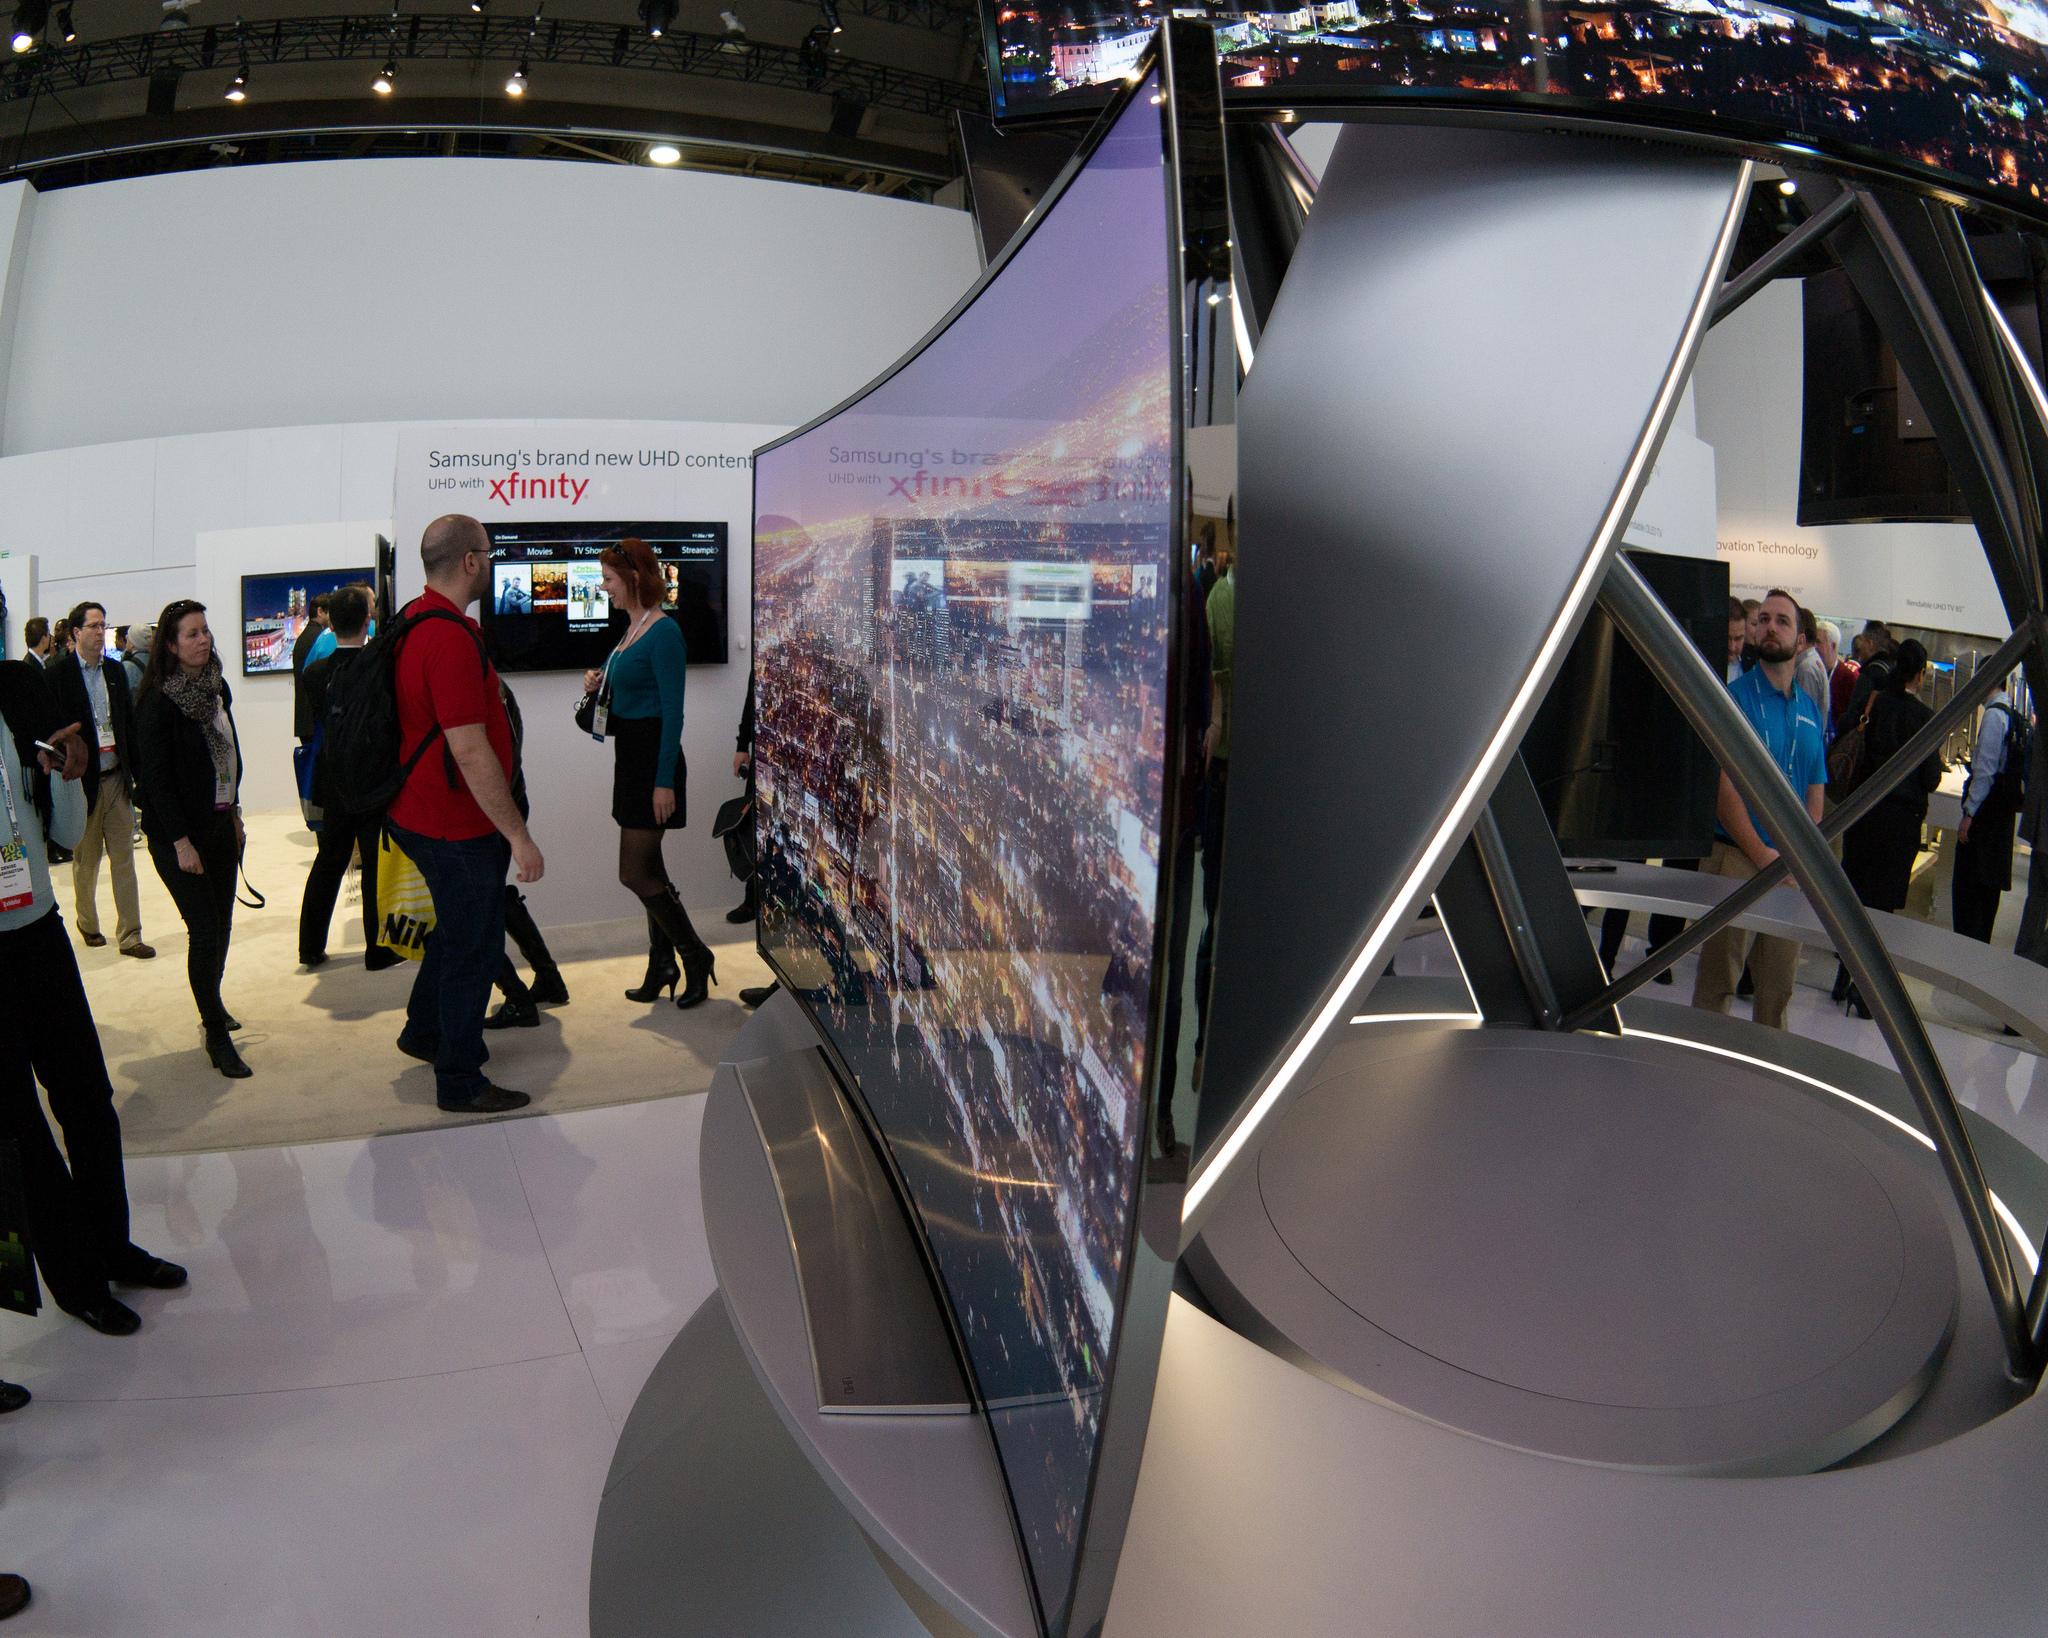 Samsung Curved LED TV. Photo by Nan Palmero.